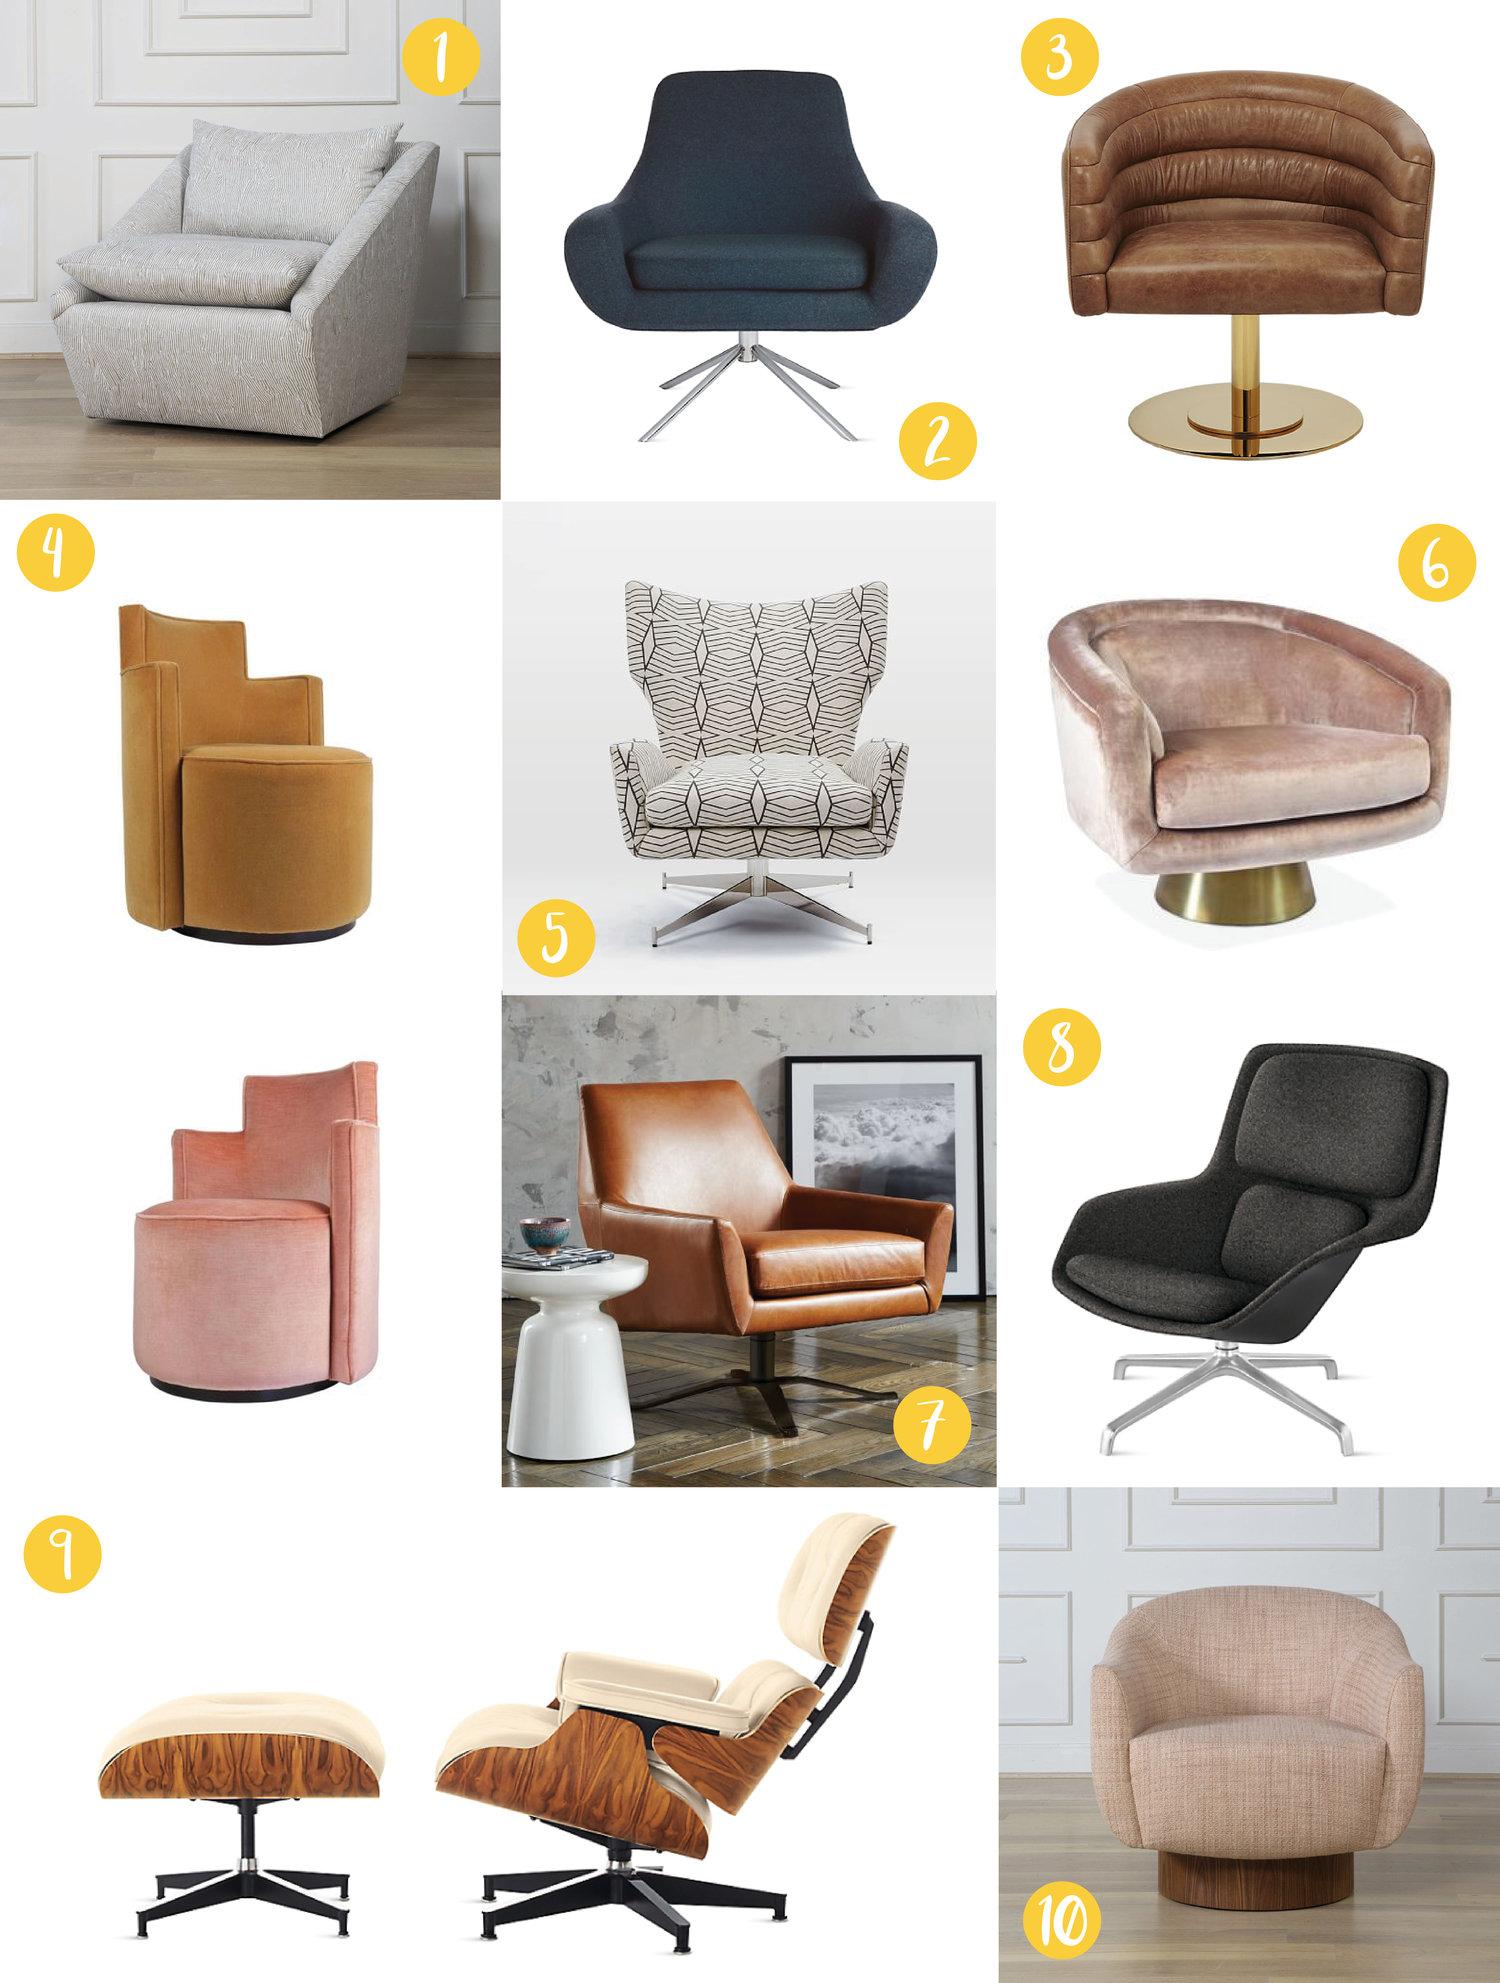 Brilliant Nyla Free Designs Inc Top 10 Swivel Chairs Inzonedesignstudio Interior Chair Design Inzonedesignstudiocom